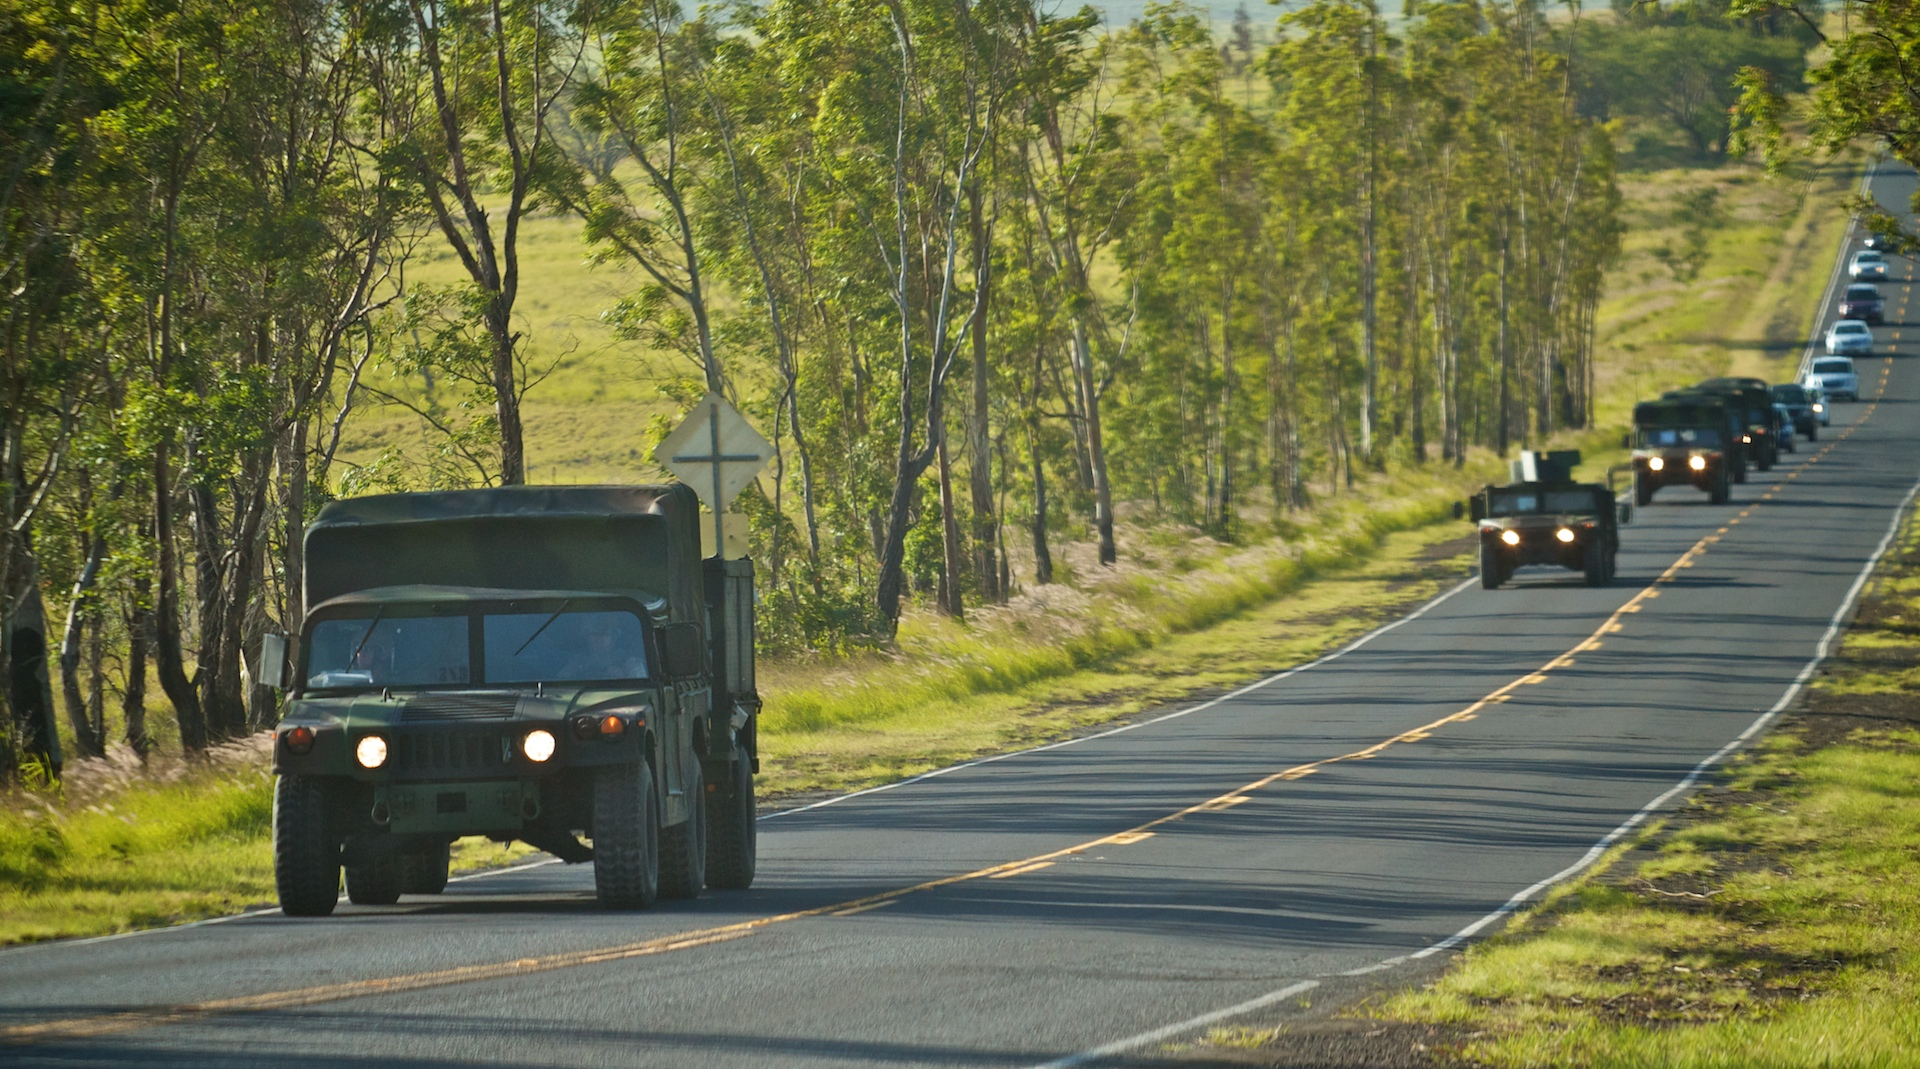 Oahu-based military units will convoy from Kawaihae Harbor to Pohakuloa Training Area May 29 between 8 a.m. and 4 p.m., via Akoni Pule-Queen Kaahumanu corridor, Waikoloa Road, Mamalahoa Highway, and Saddle Road.